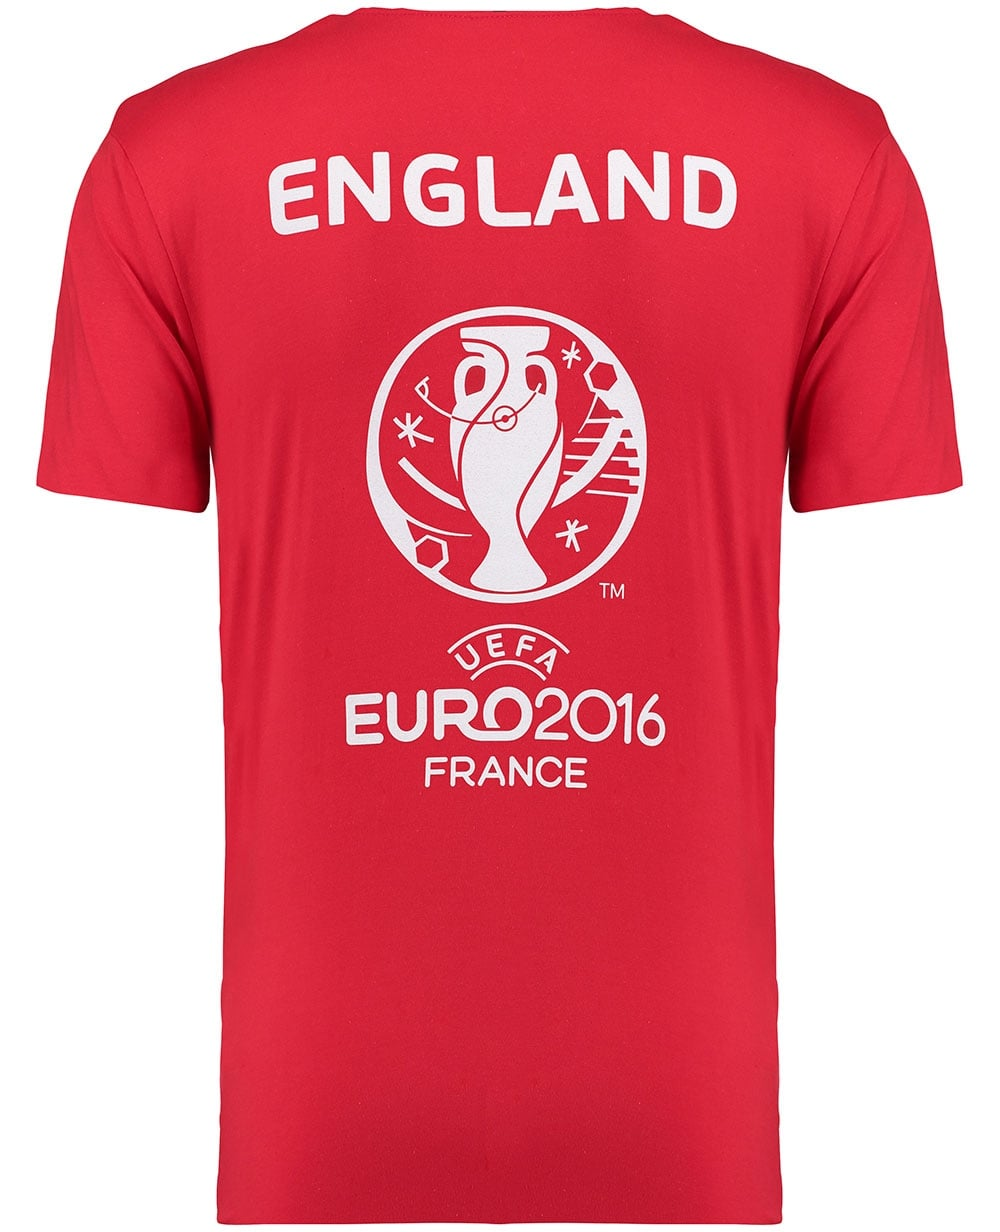 magazin online renumit are reduceri mari dupa eliminarea echipei favorite de la EURO